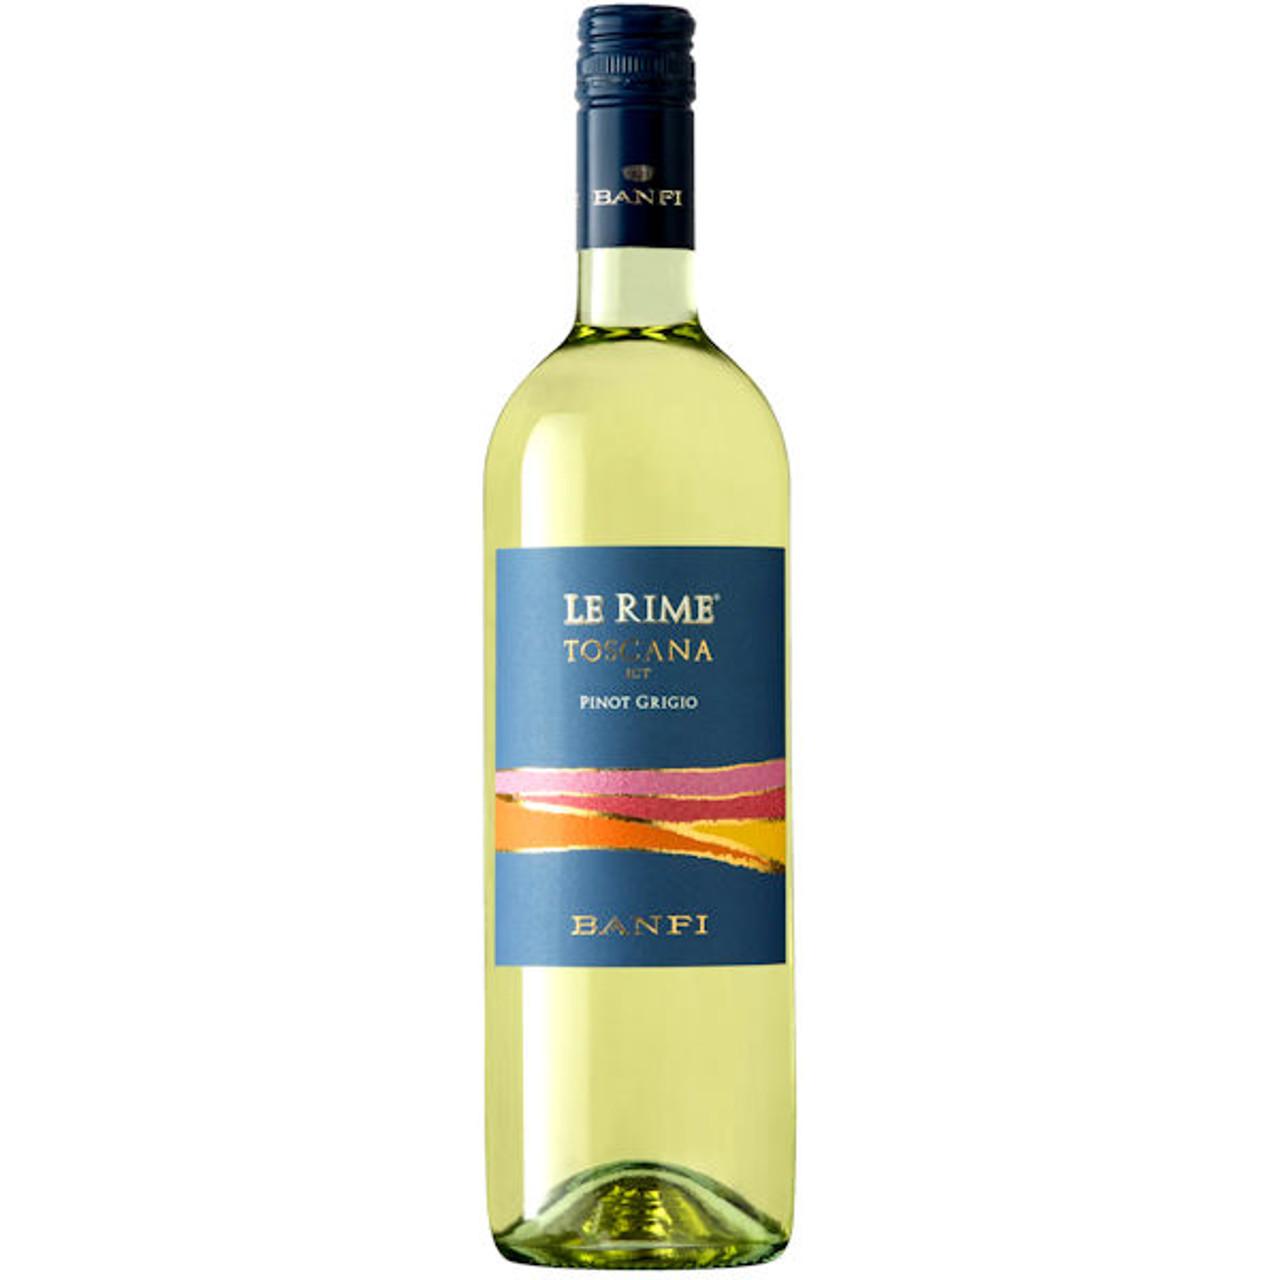 Banfi Le Rime Pinot Grigio IGT